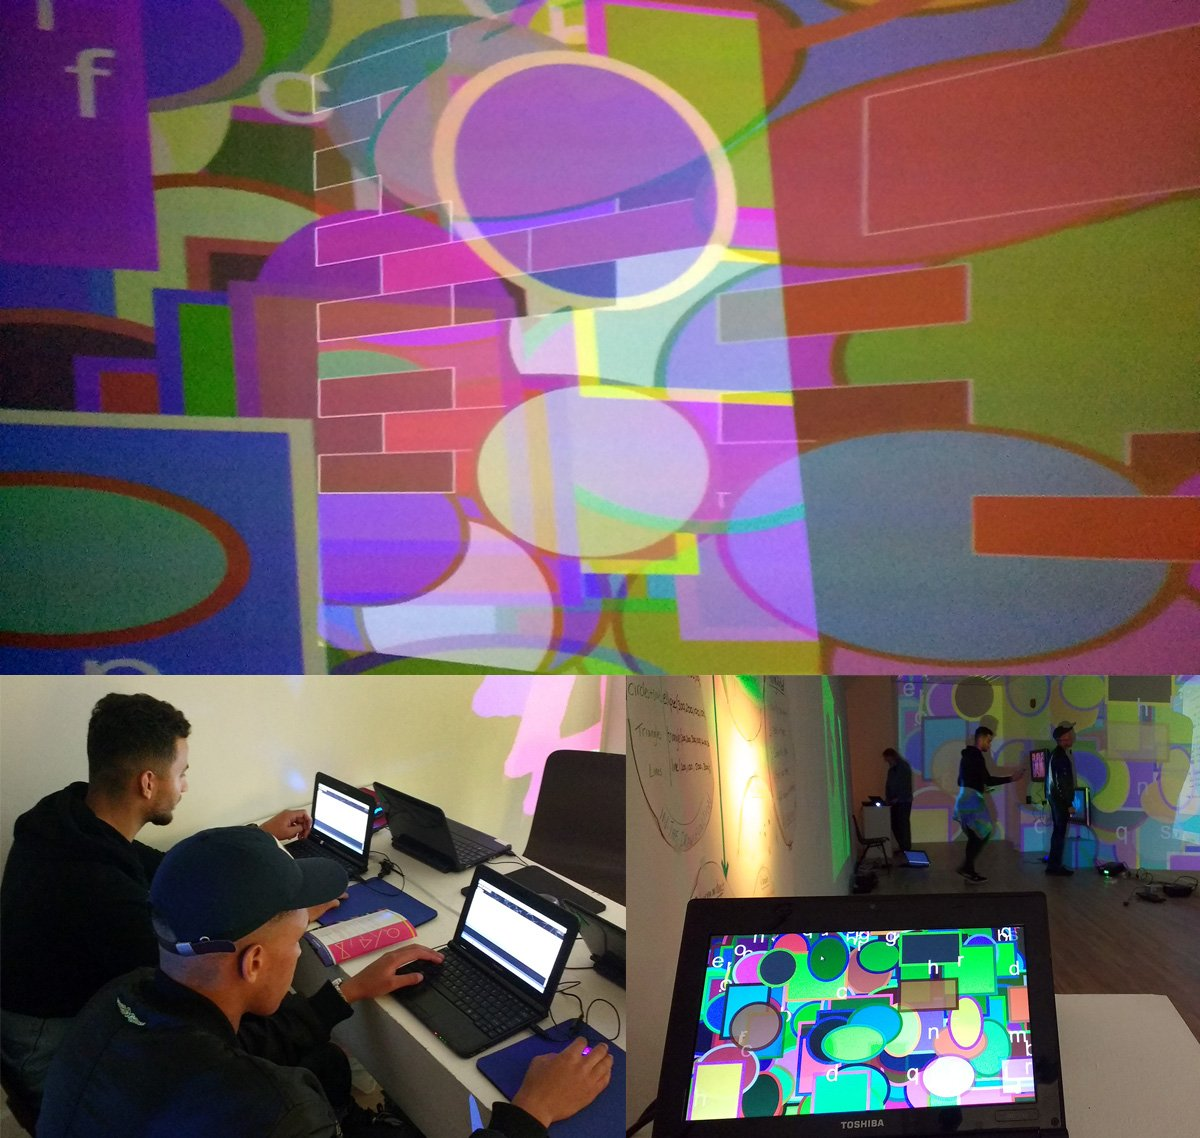 Neo Queens Arcade: Queens Arcade (@QueensArcade)